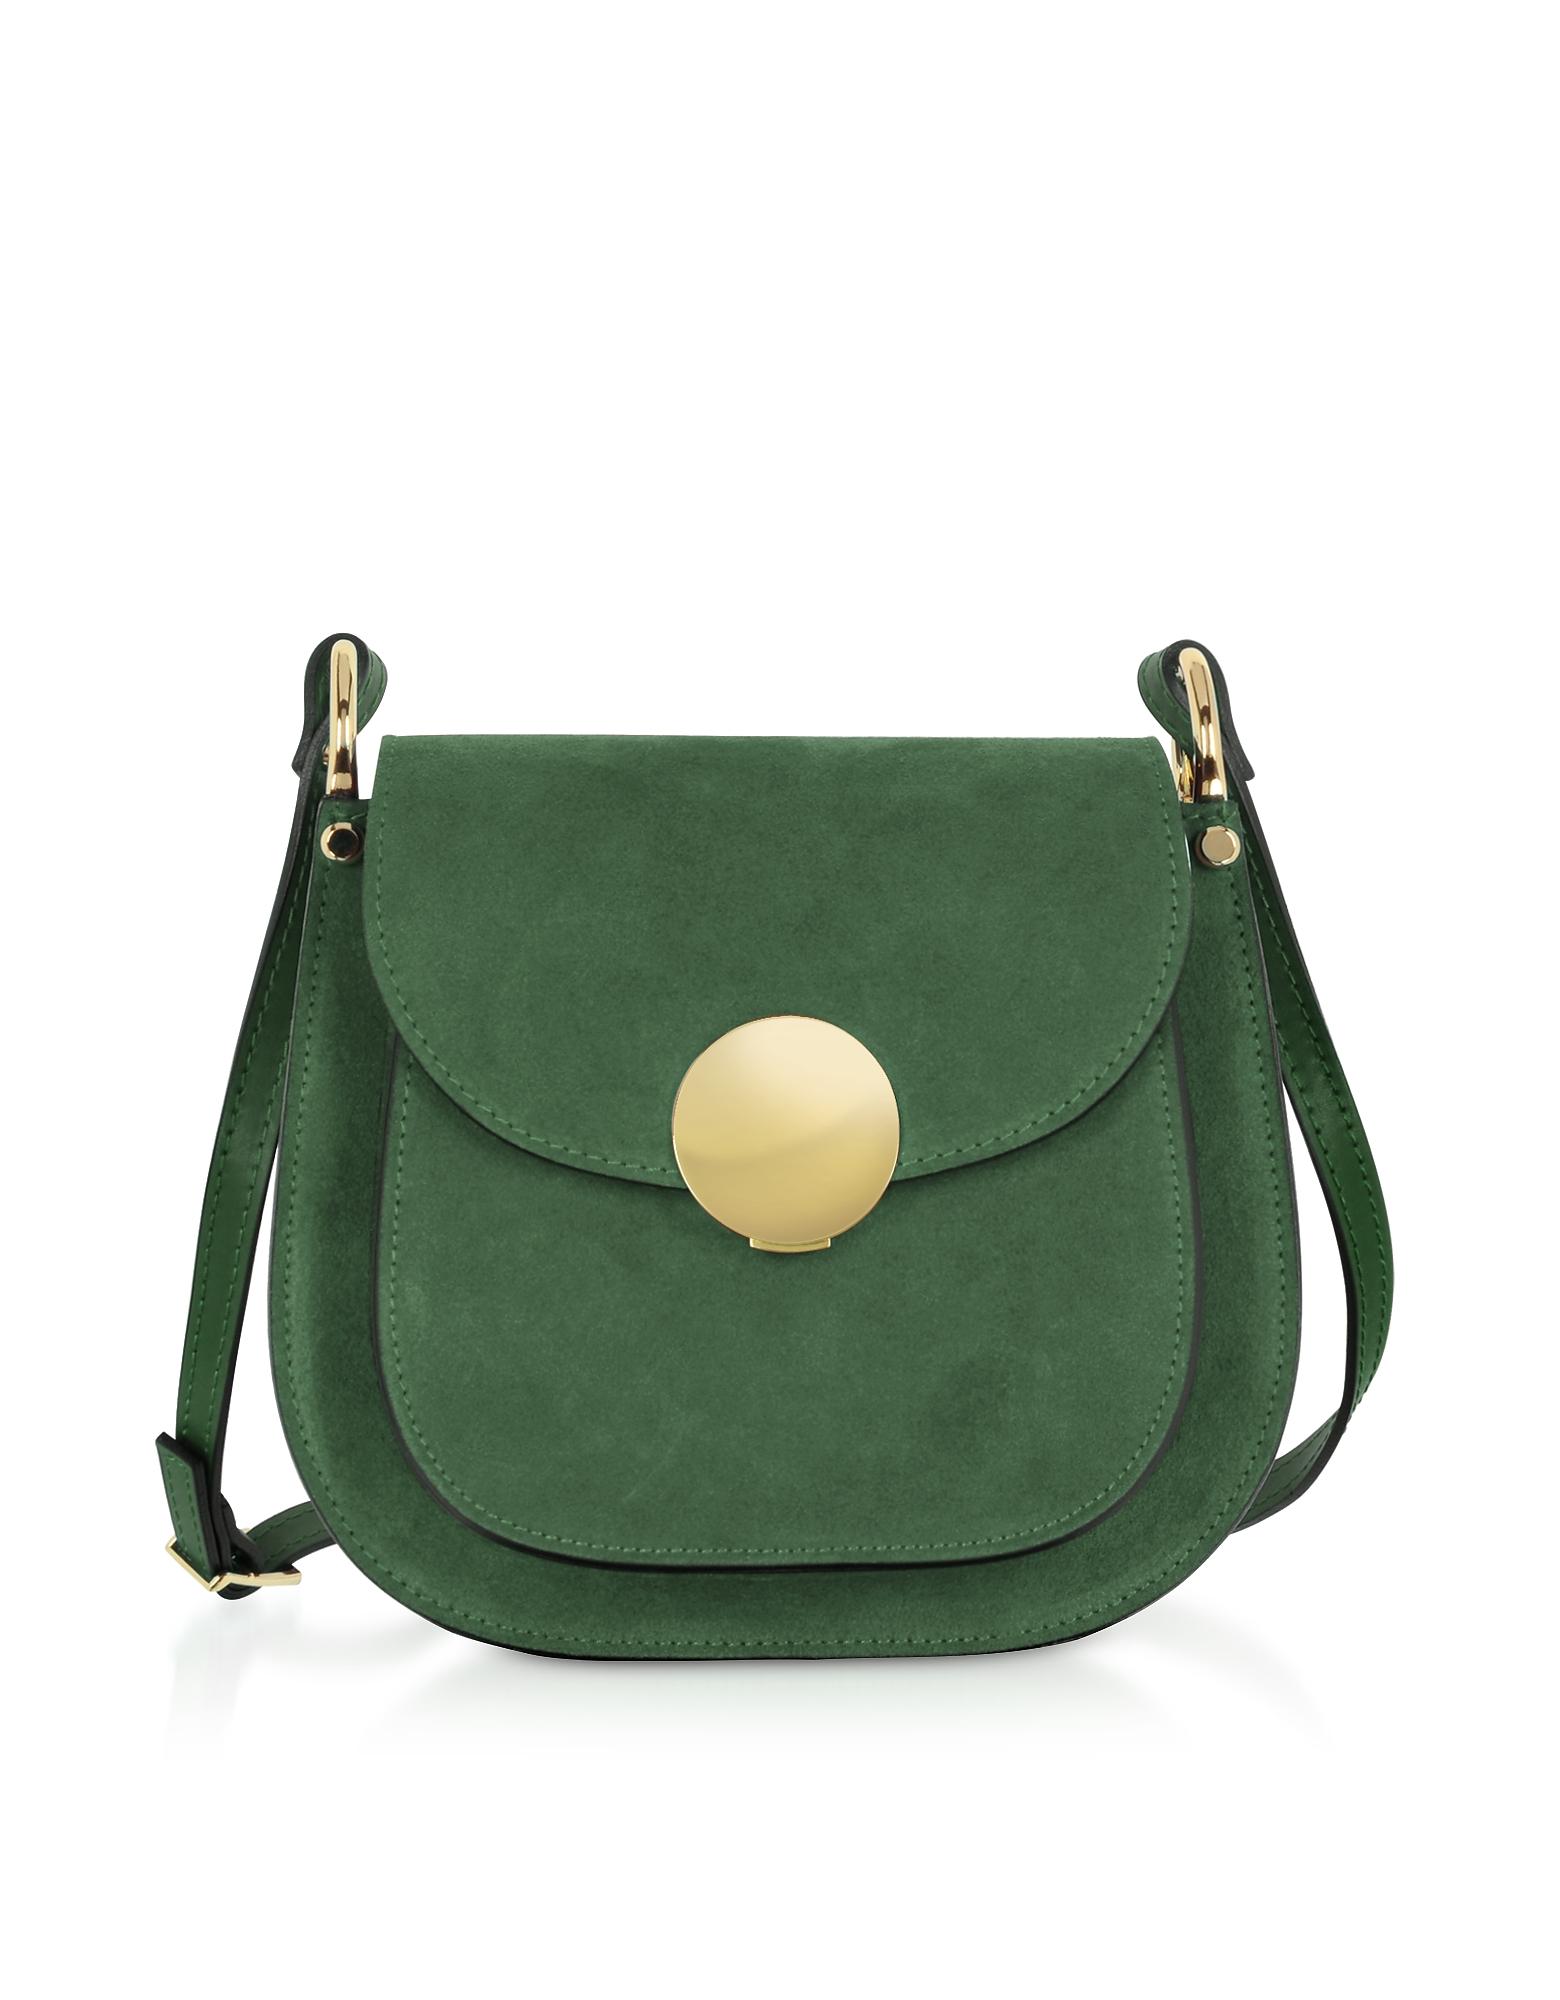 Le Parmentier Designer Handbags, Agave Suede and Smooth Leather Shoulder Bag